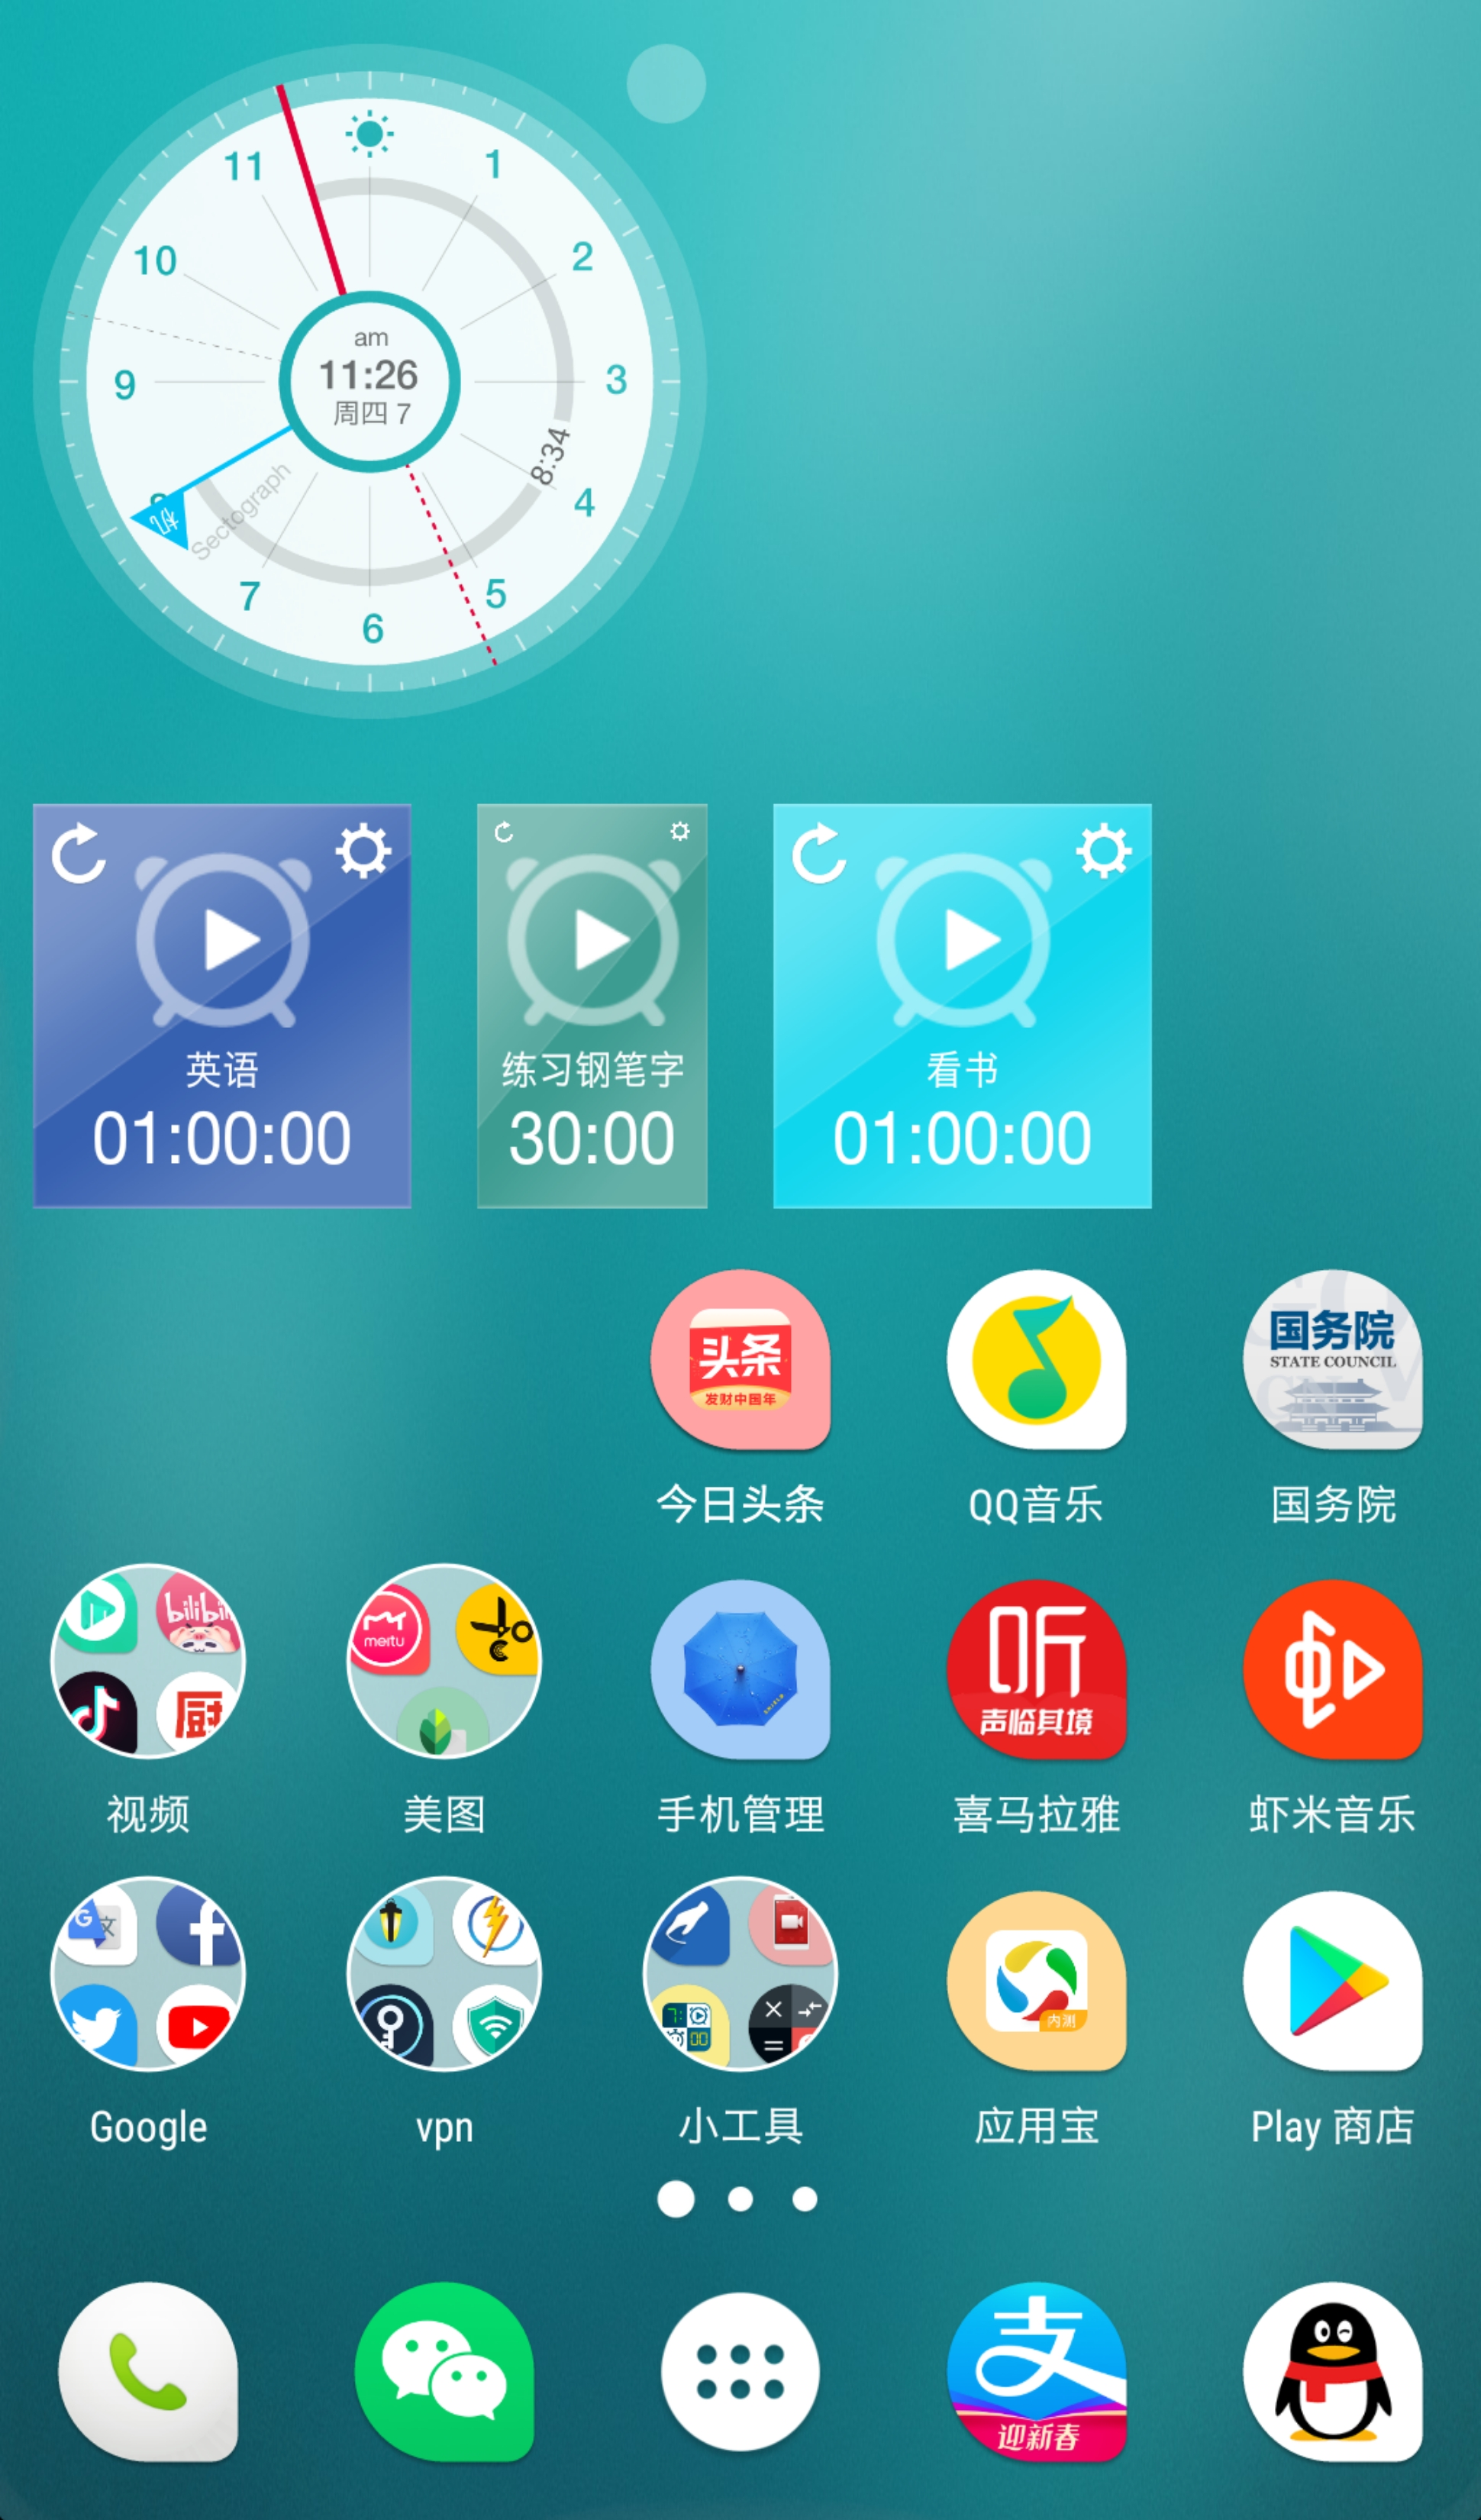 Screenshot_2019-02-07-11-27-00-255_Nova Launcher.png